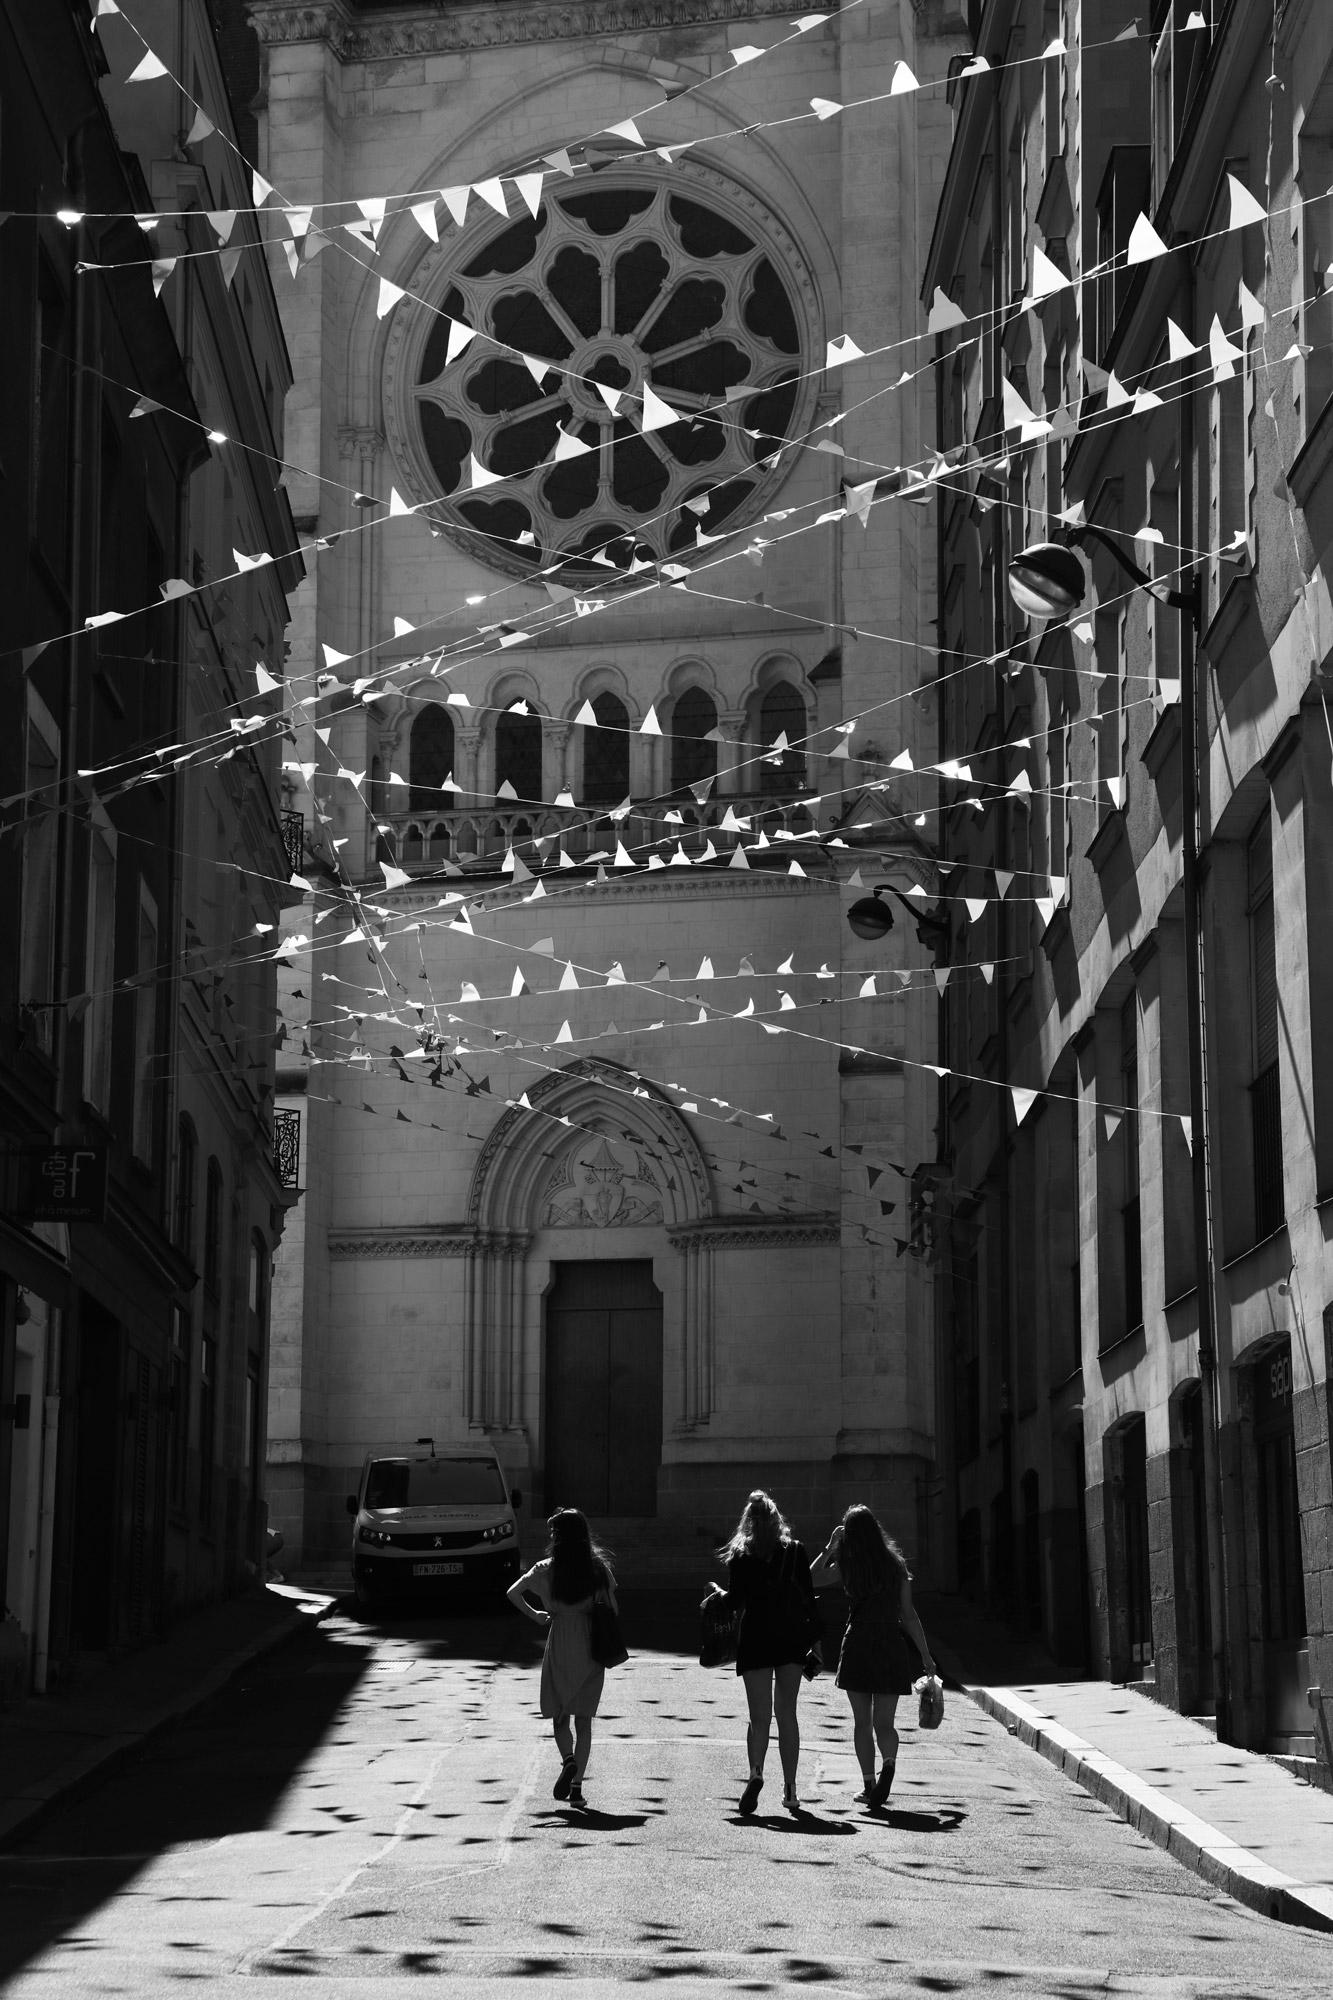 """The celebration street"" - Rue du Pré Nian, Nantes. ©Clémence Rougetet"